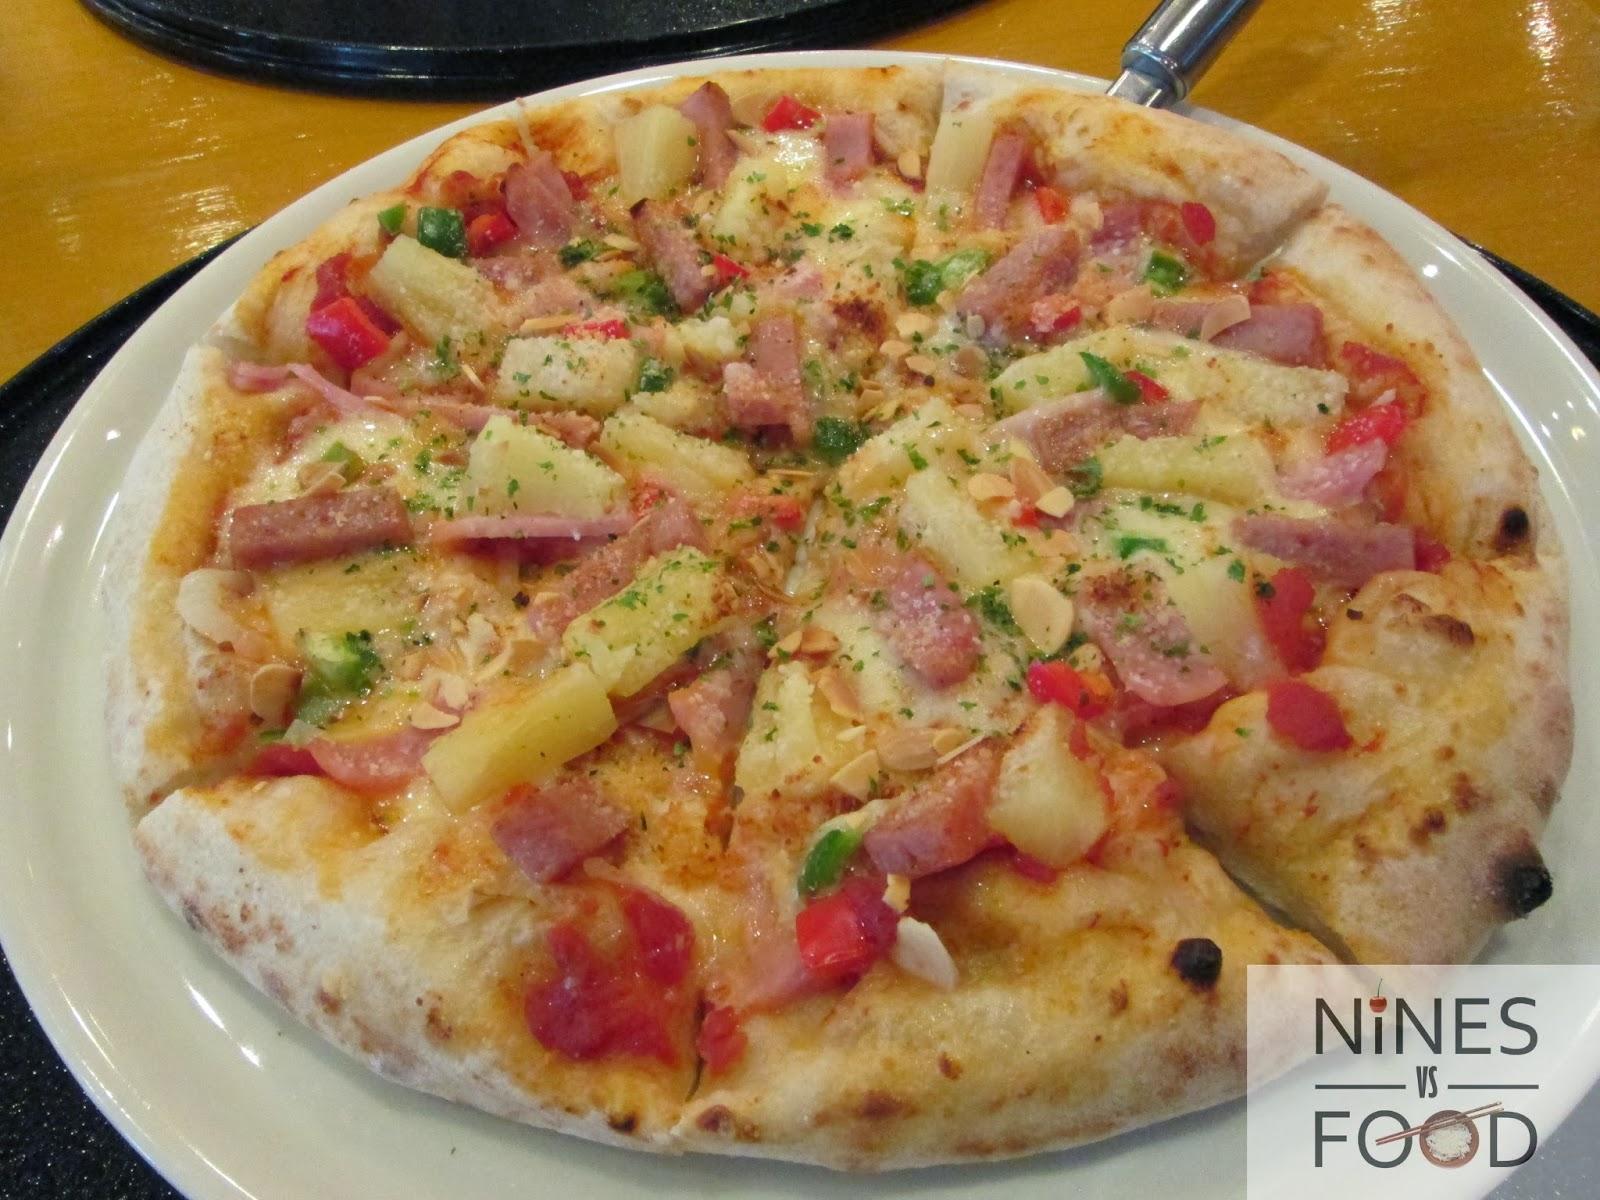 Nines vs. Food - Yomenya Goemon Greenbelt 3 - 11.jpg